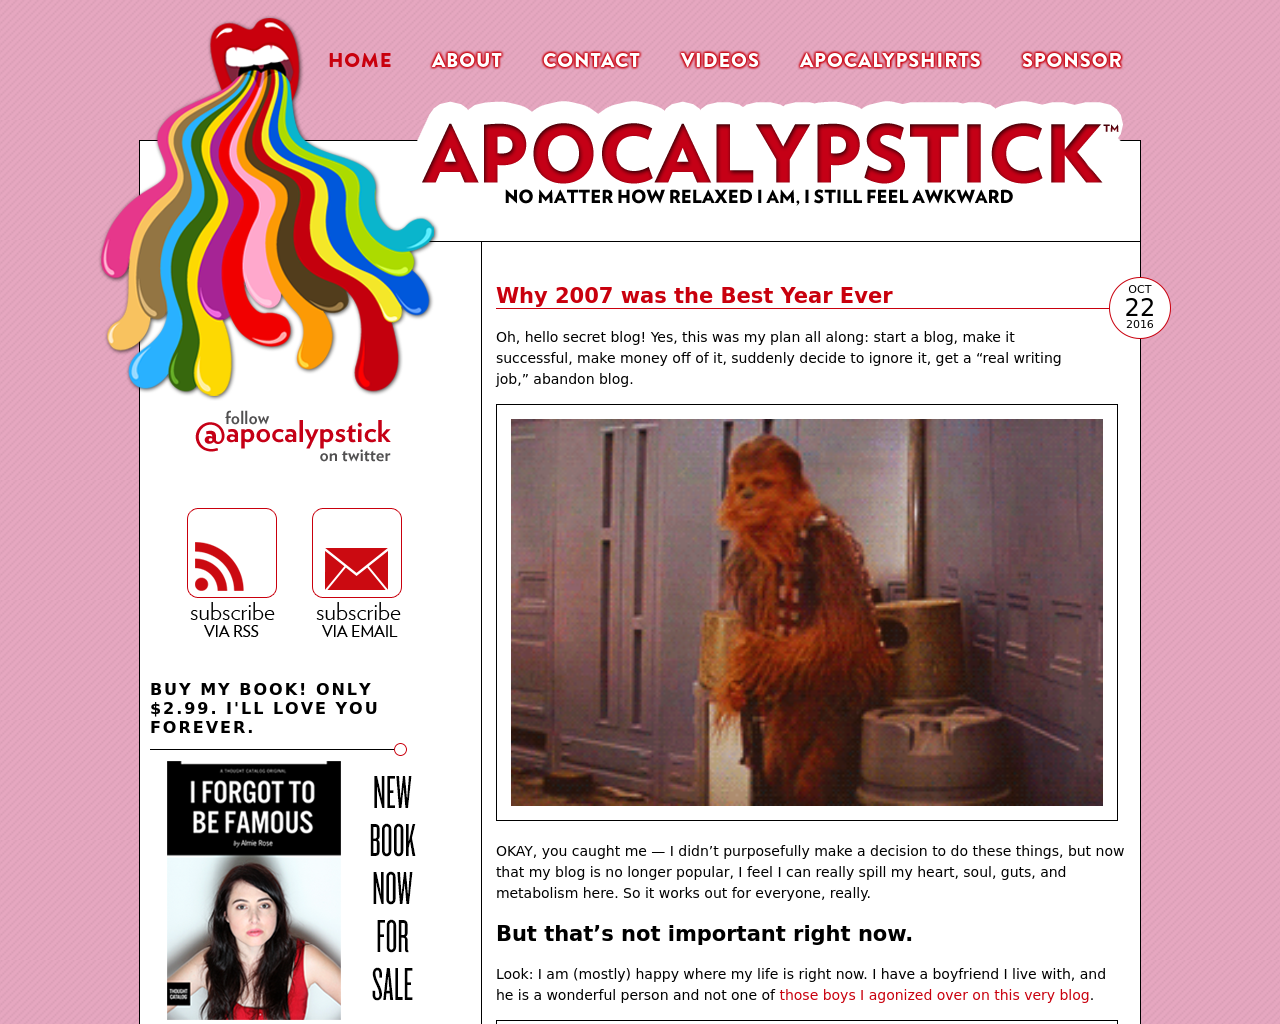 APOCALYPSTICK-Advertising-Reviews-Pricing